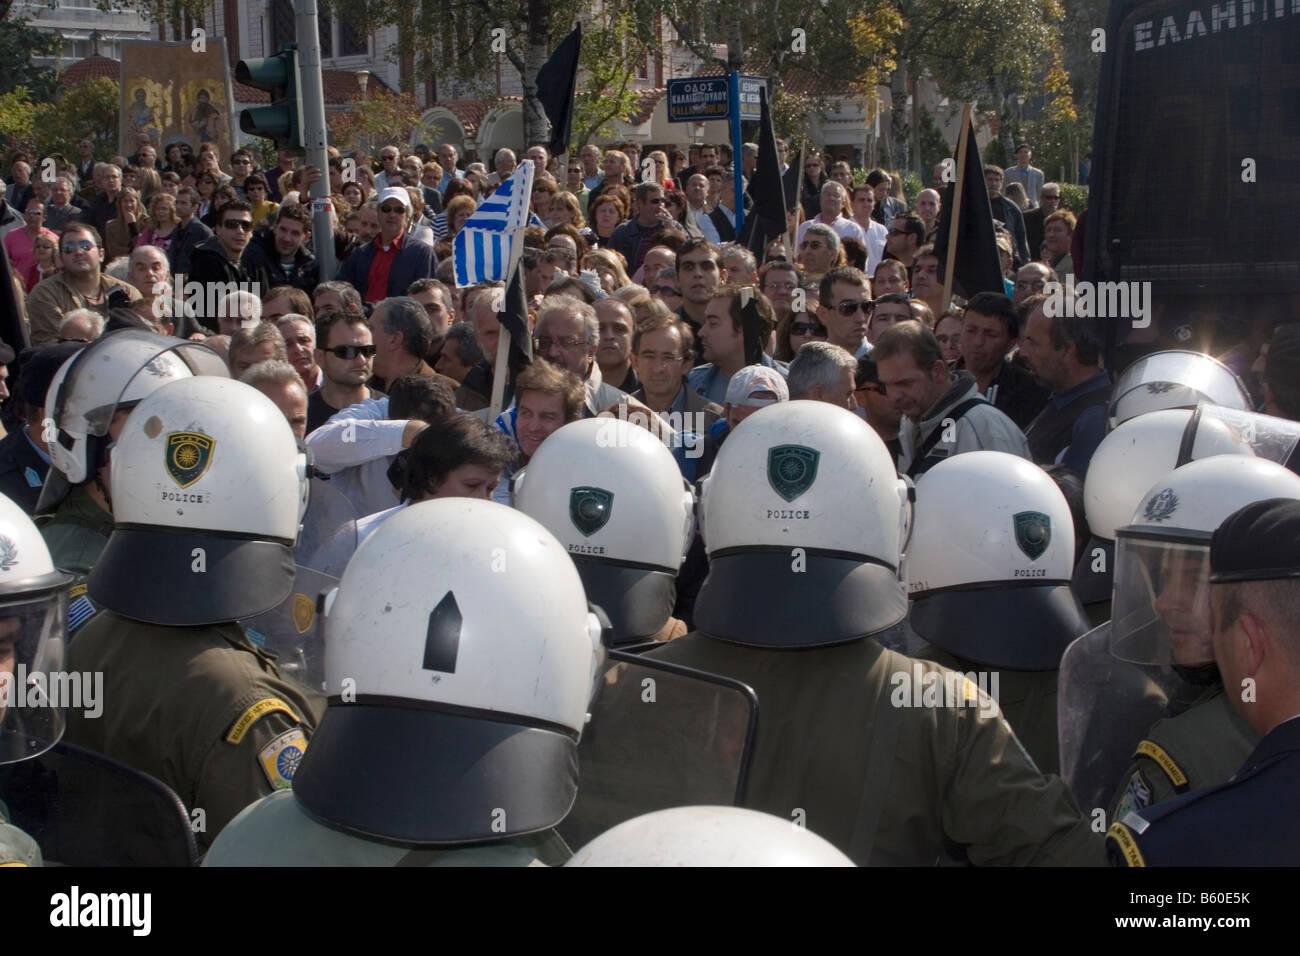 Les citoyens contre la police Photo Stock